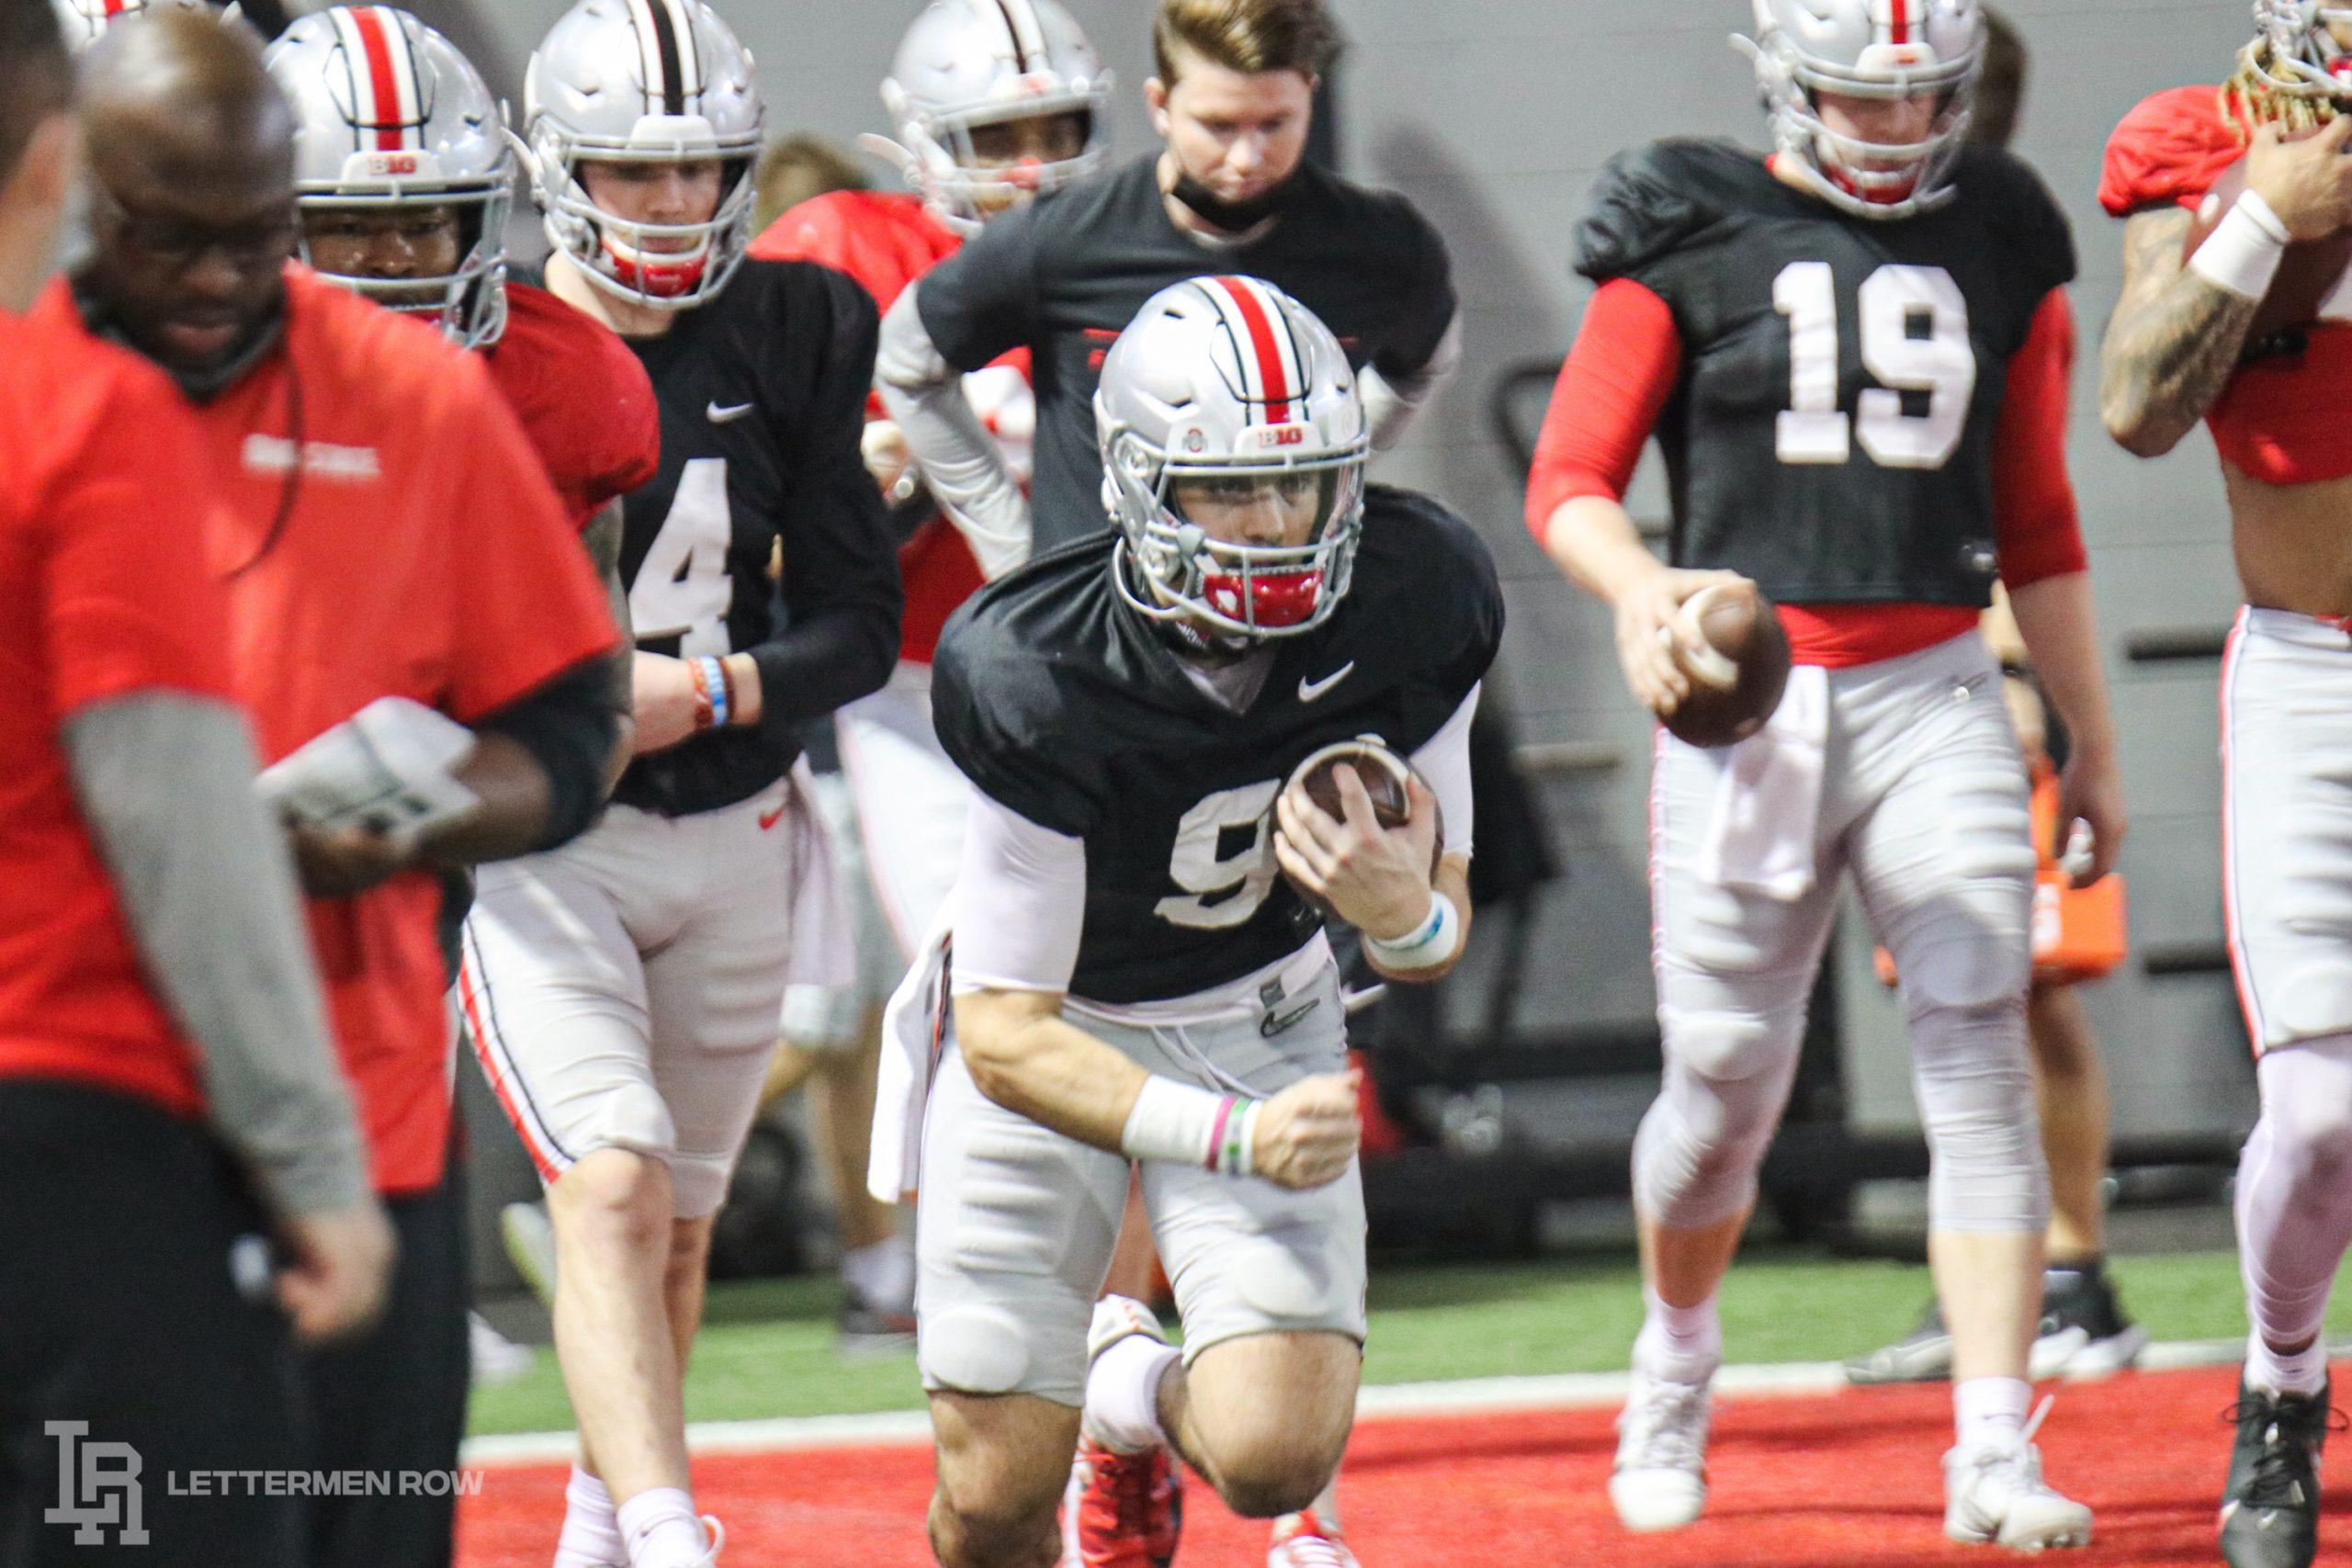 jack miller-jack miller ohio state-jack miller buckeyes-jack miller quarterback-jack miller cj stroud-ohio state football-buckeyes football